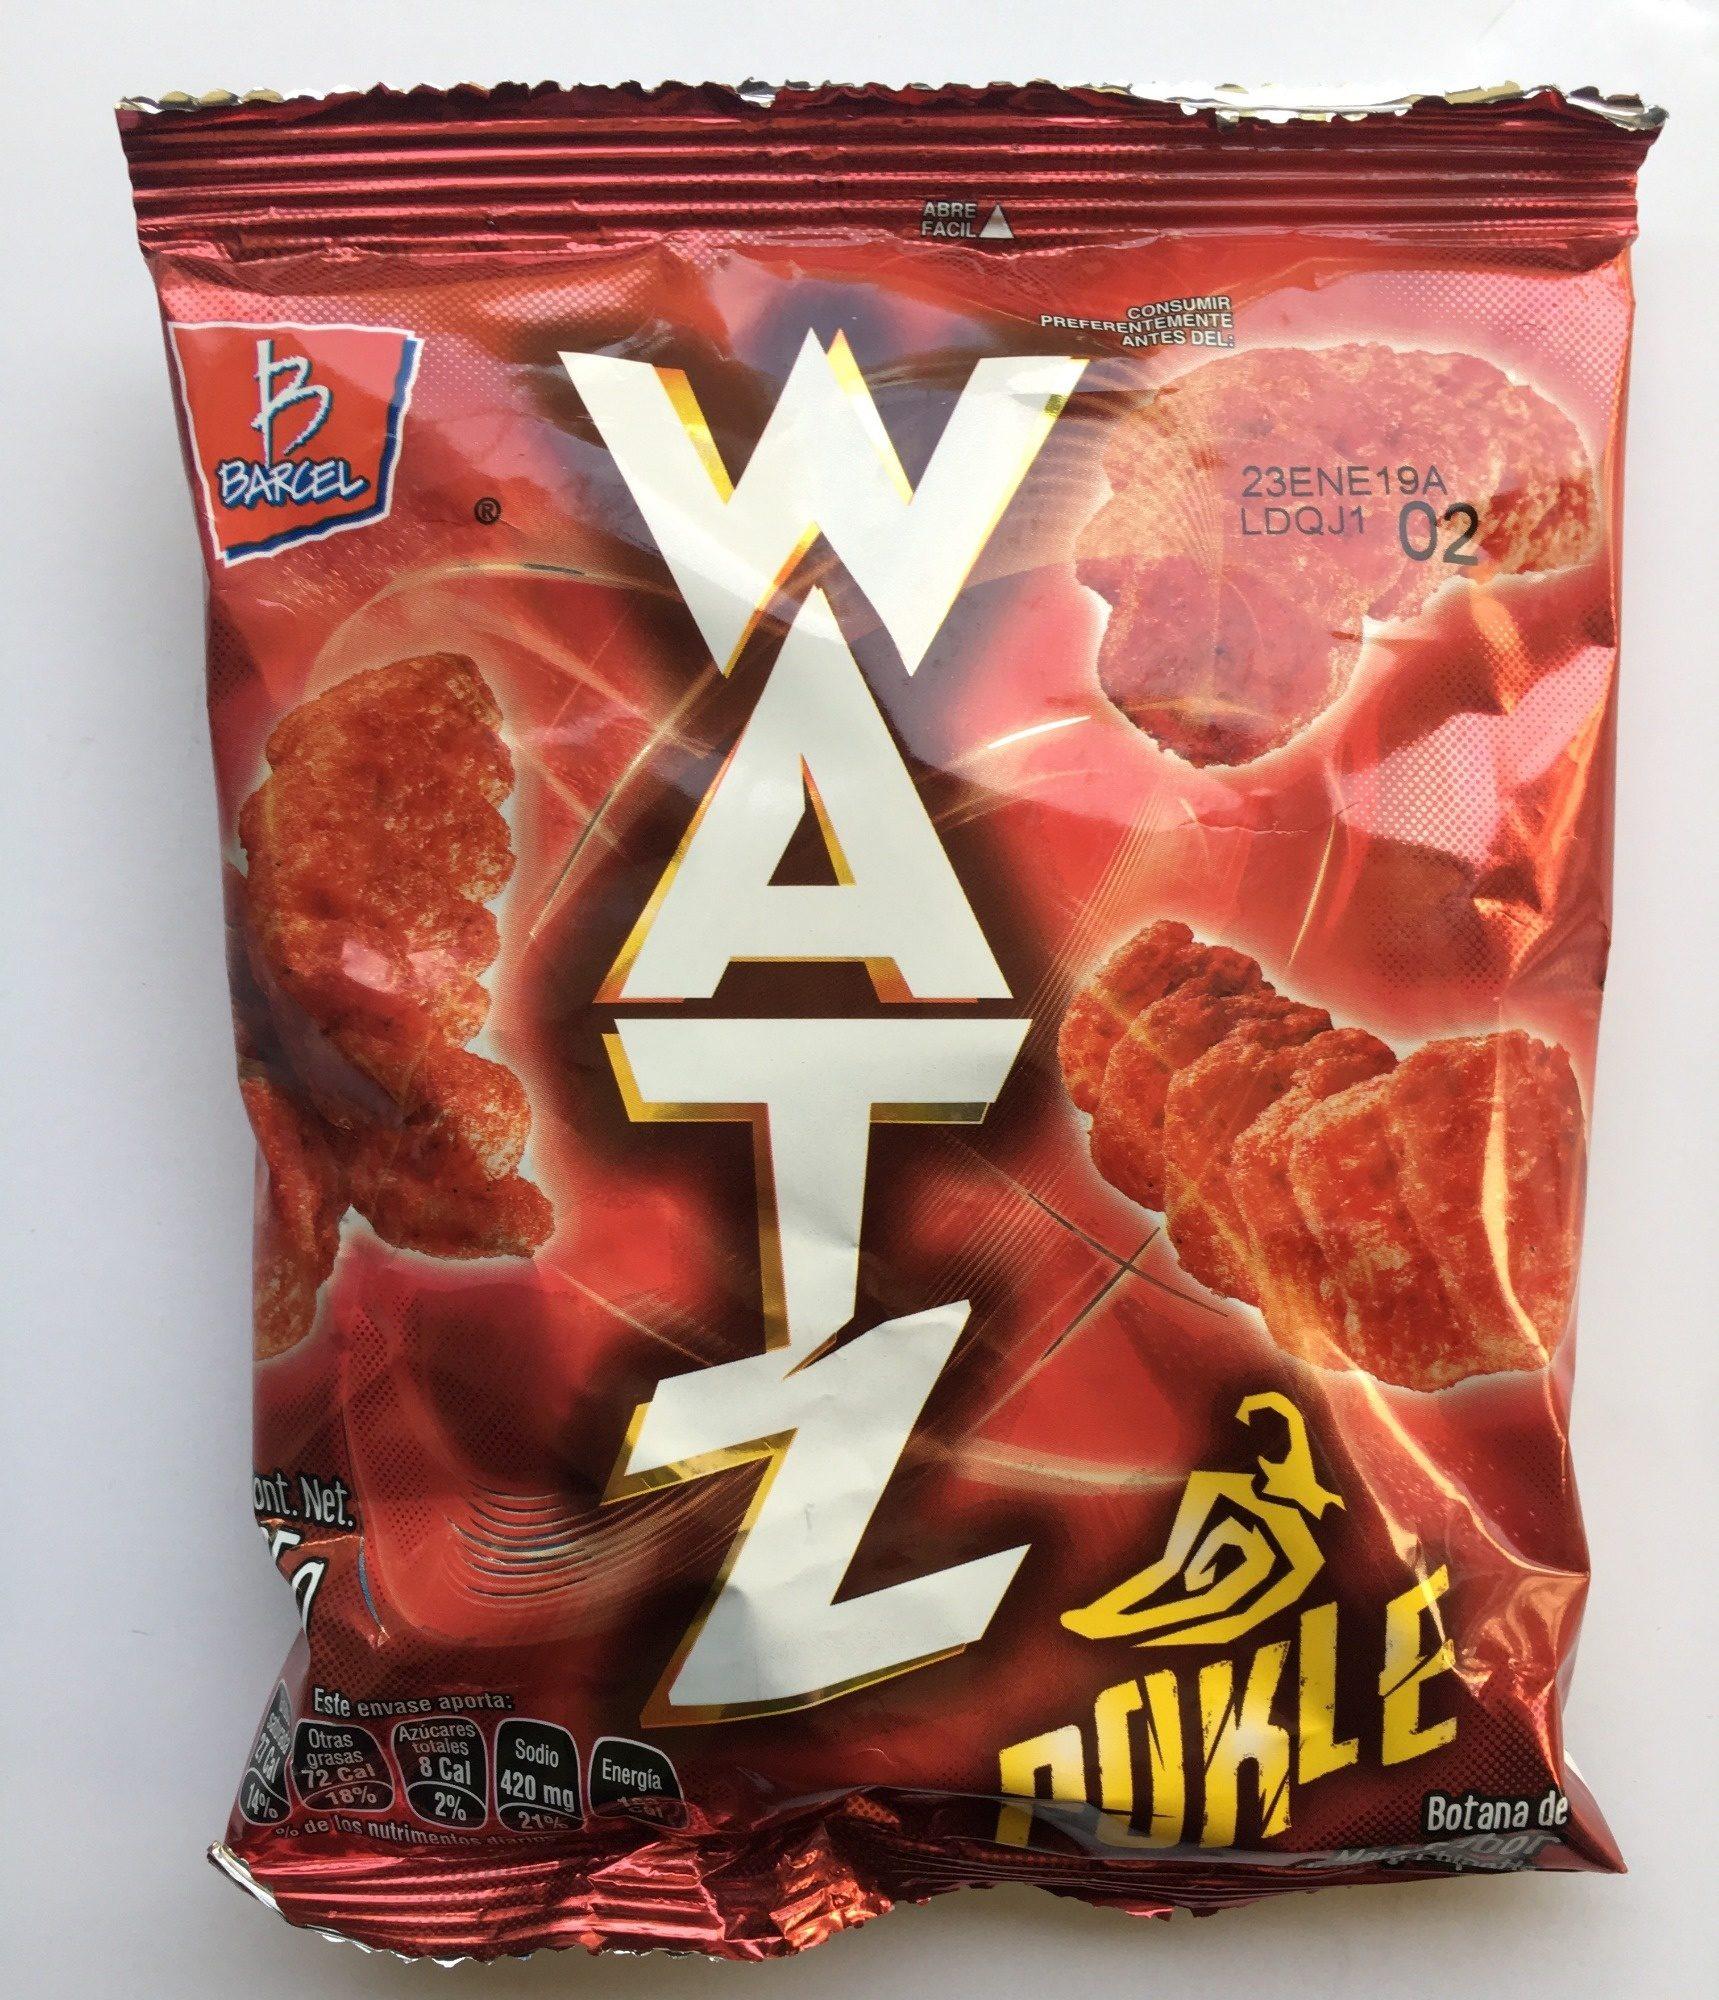 Watz Pokle - Product - es